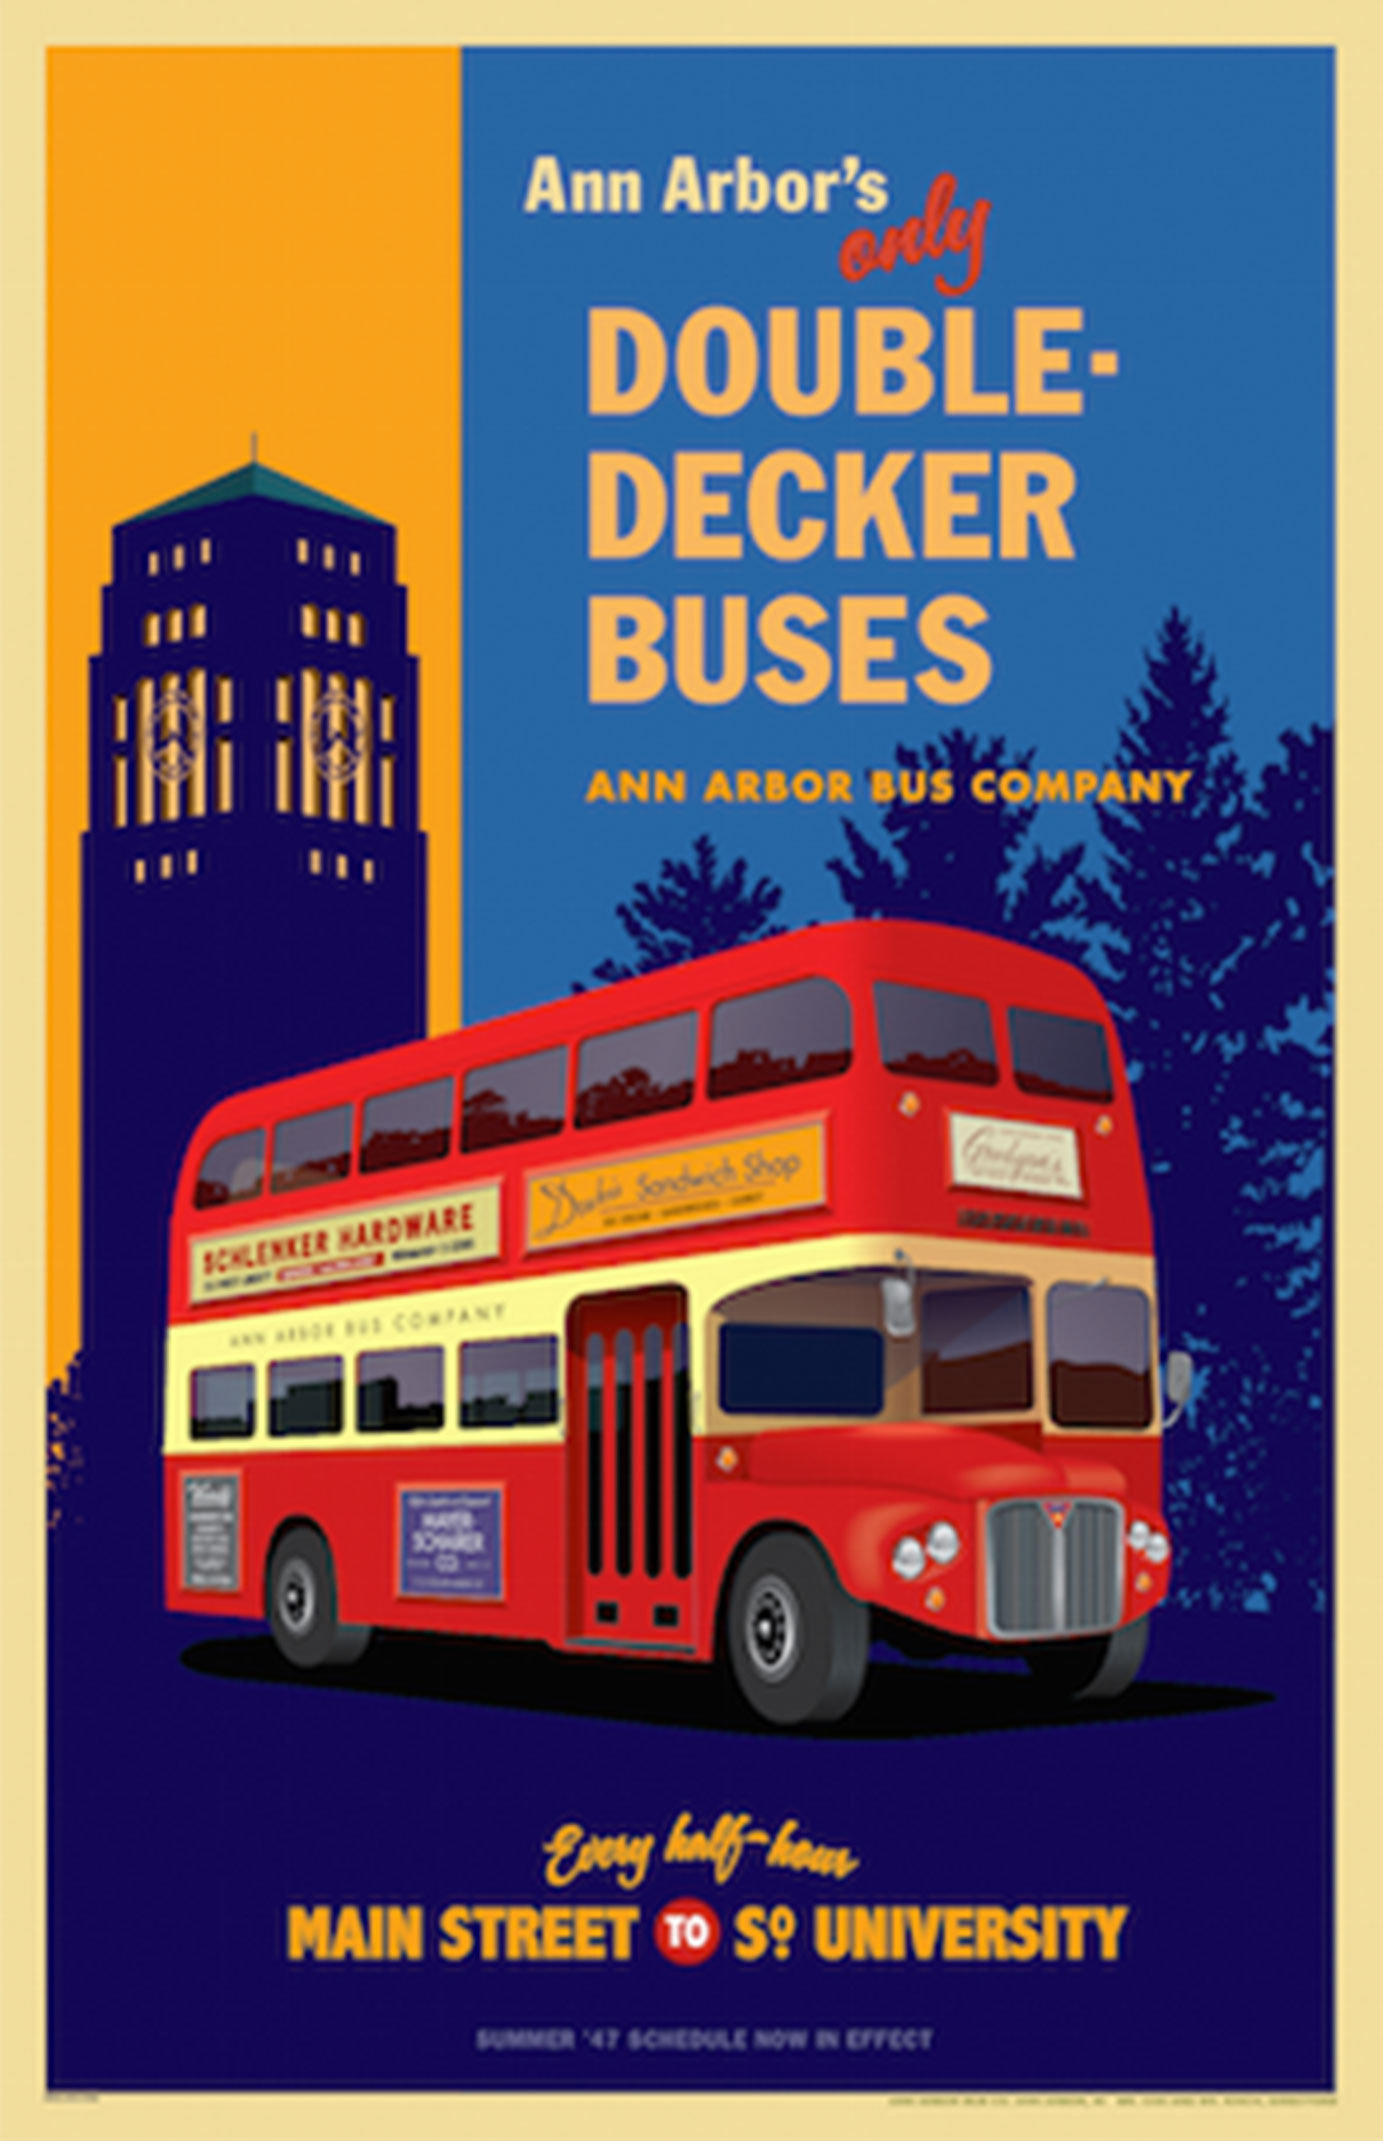 Ann Arbor Double Decker Buses Poster